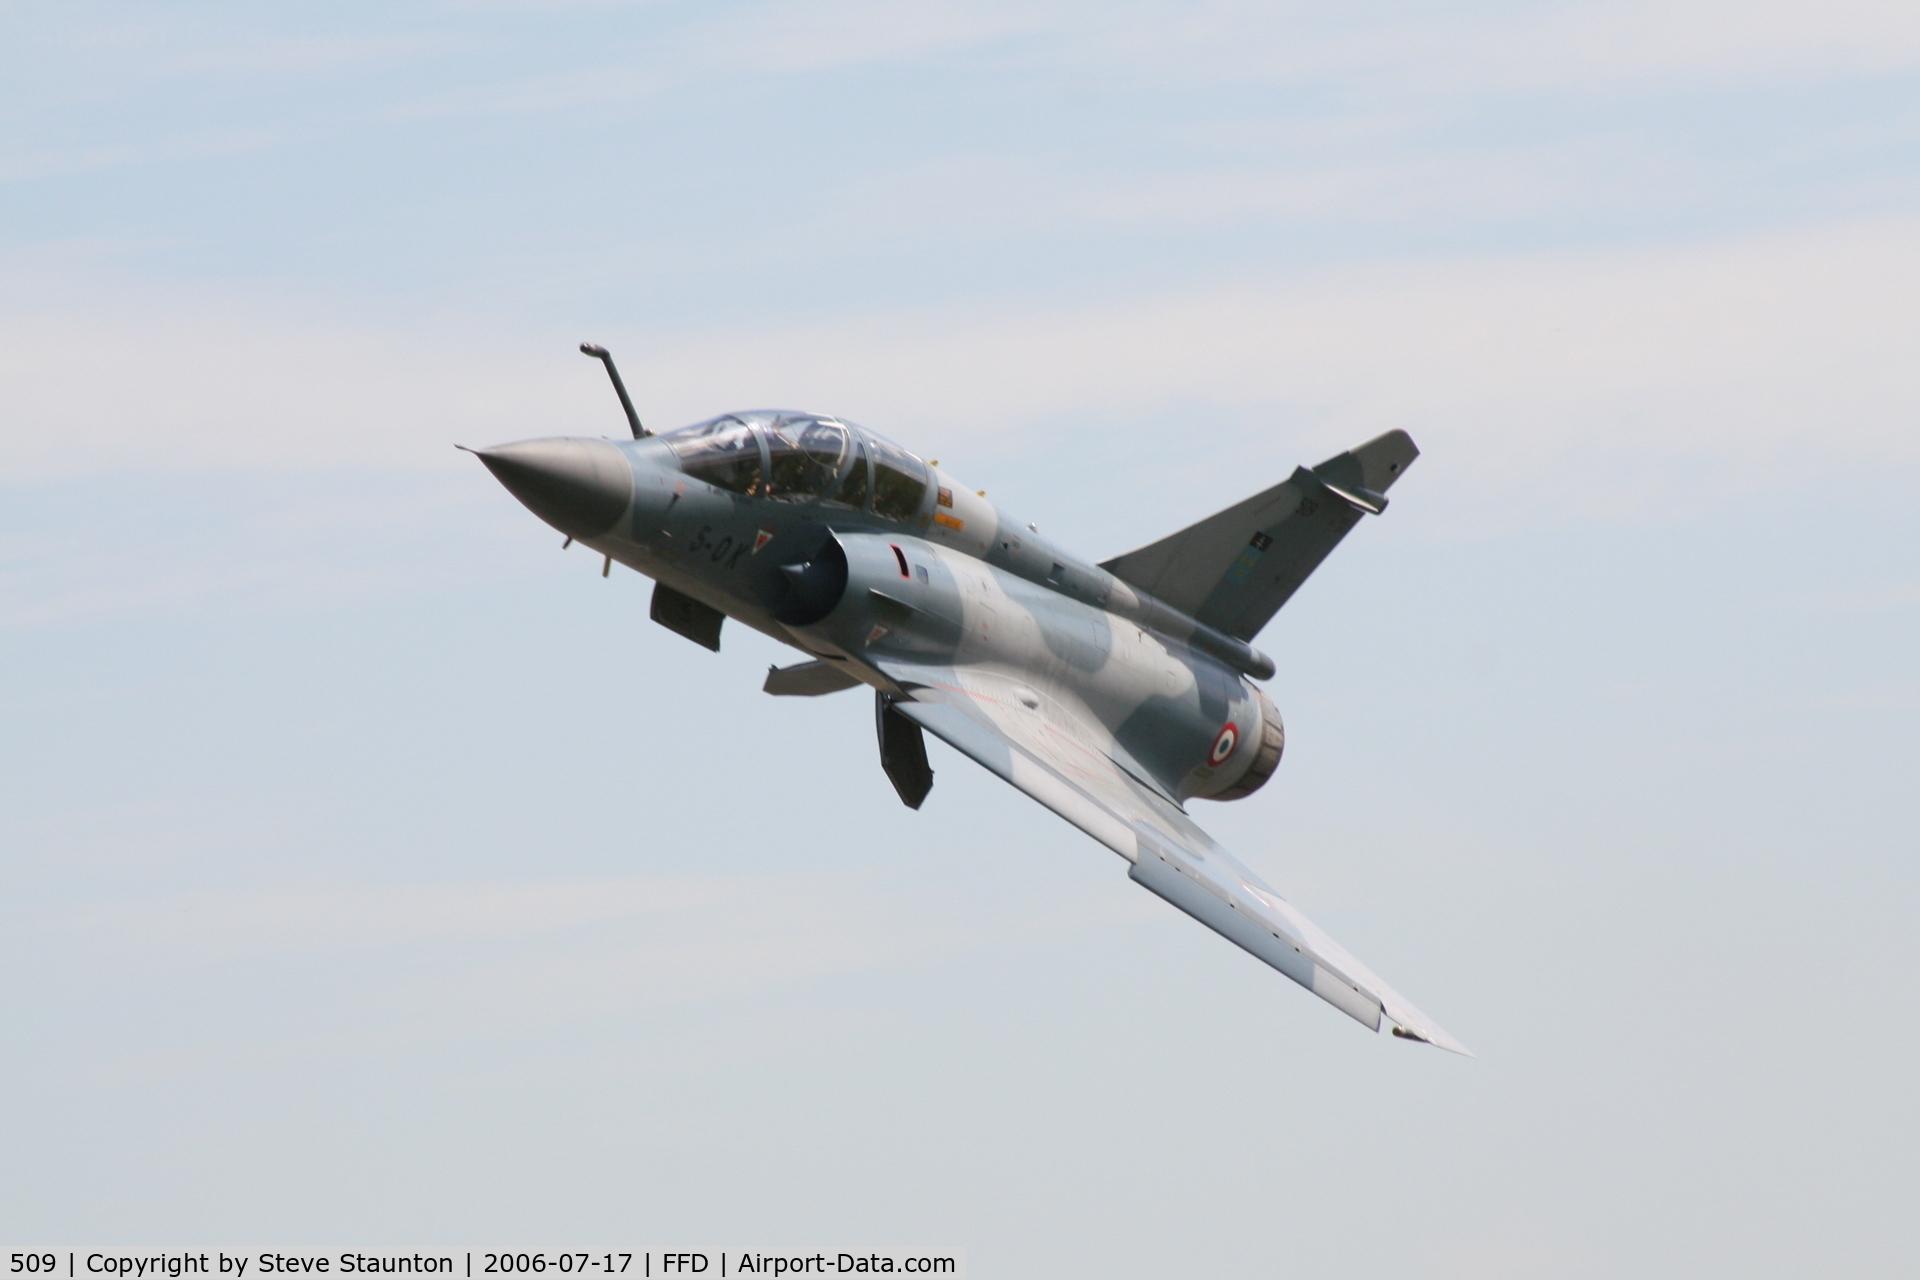 509, Dassault Mirage 2000B C/N 62, Royal International Air Tattoo 2006